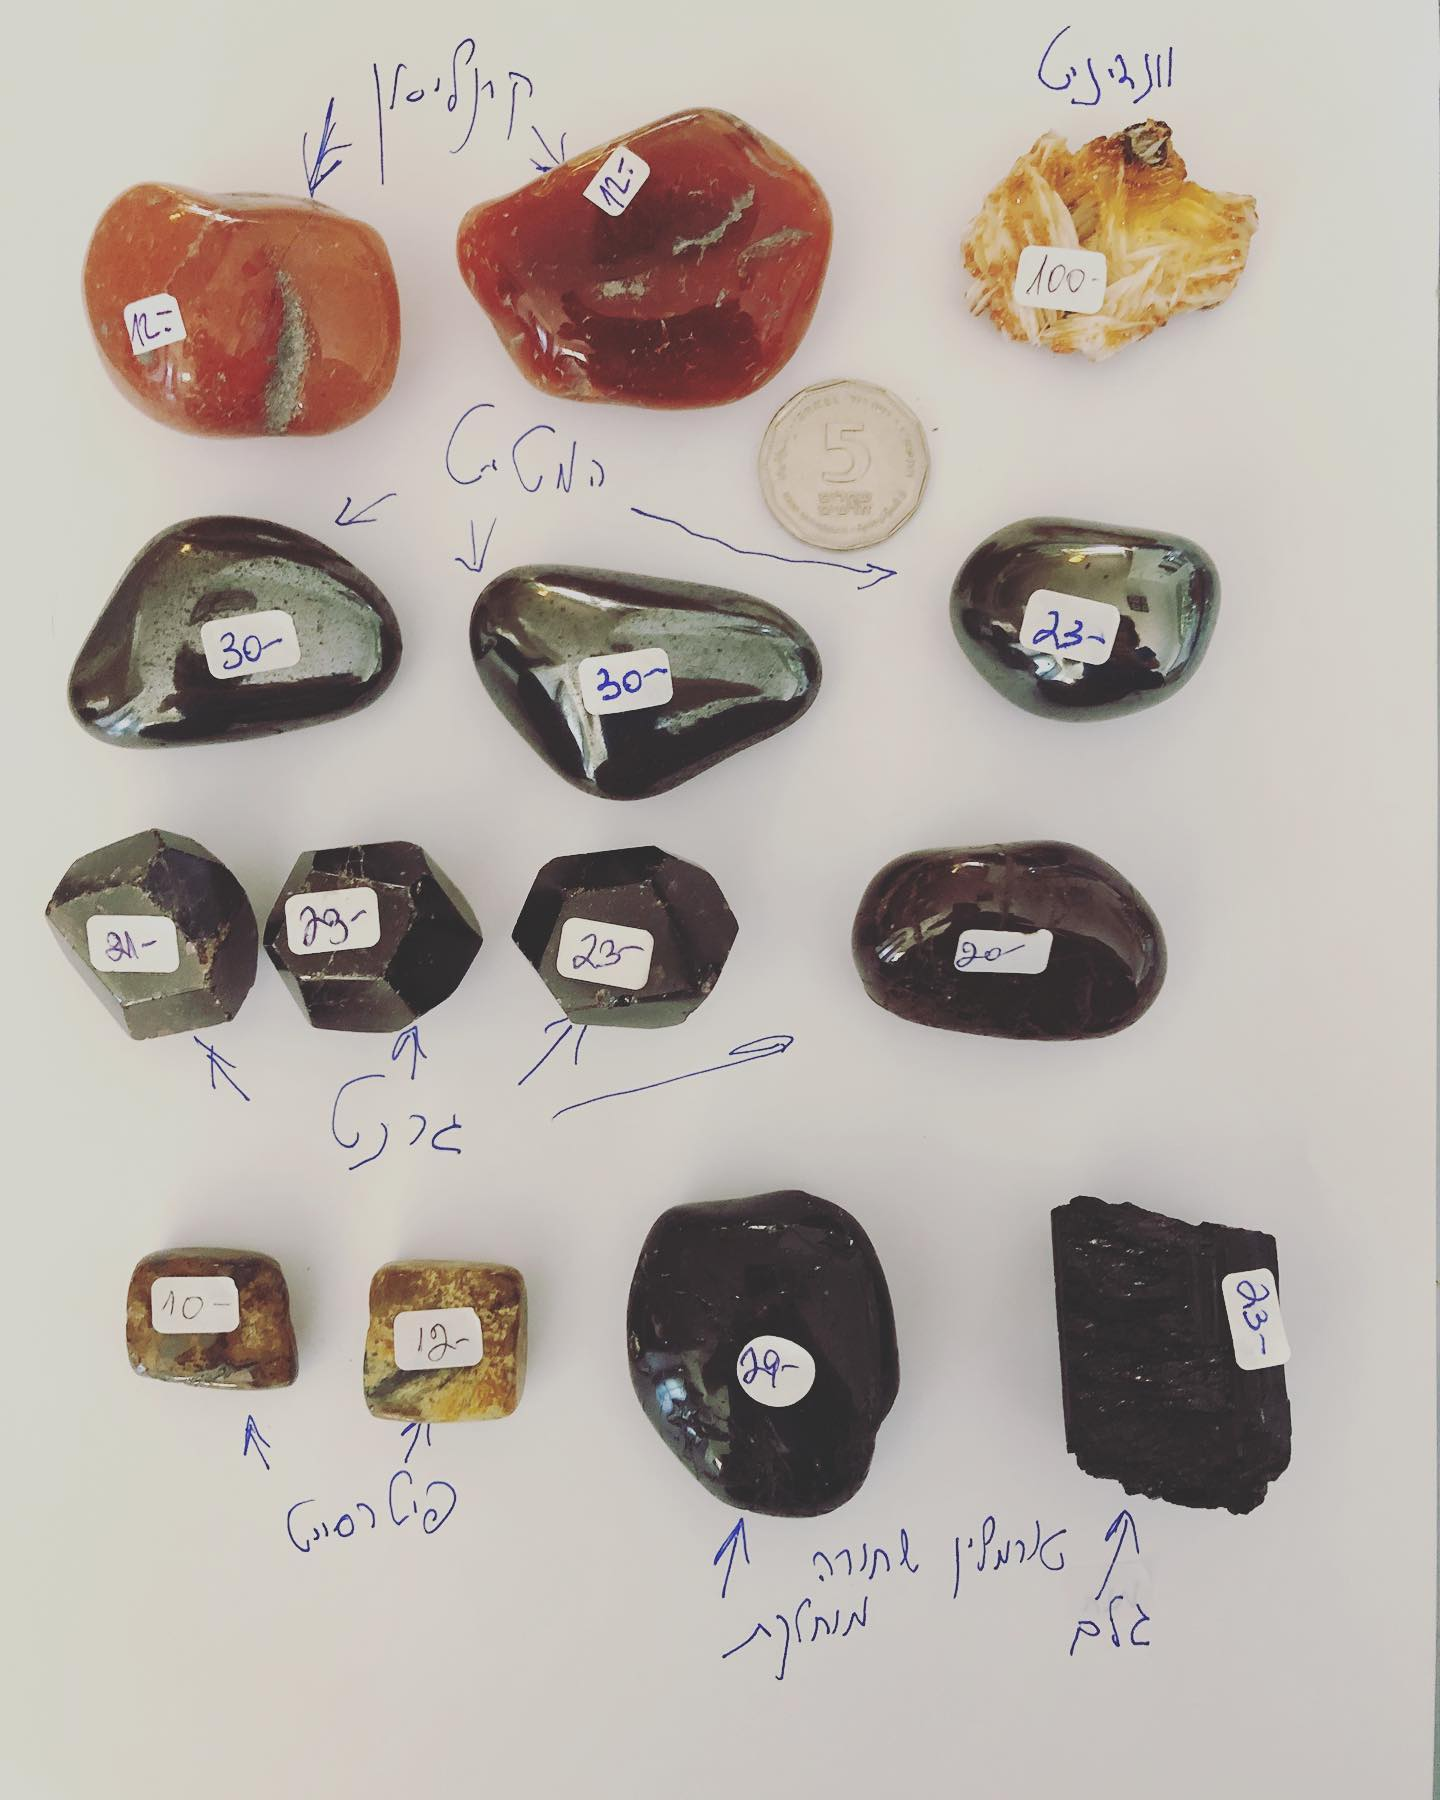 אבנים שונות: קרנליאן, המטייט, טורמלין, ונדינייט.